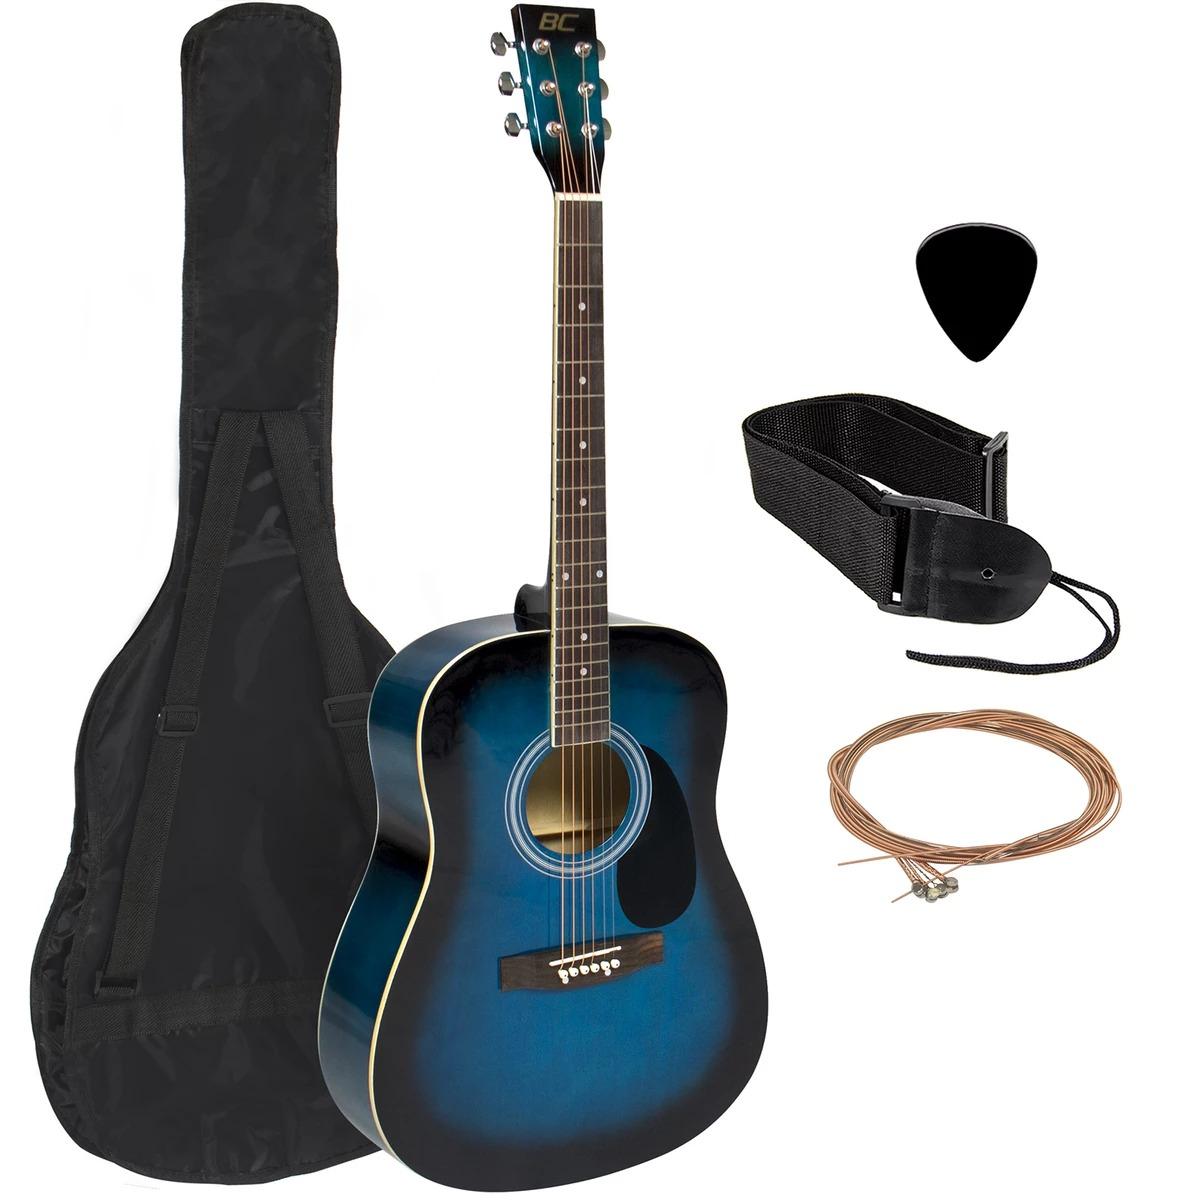 BCP 民謠吉他 (含保護套, 撥片, 背帶, 琴弦) $54.99(原價$159.99)